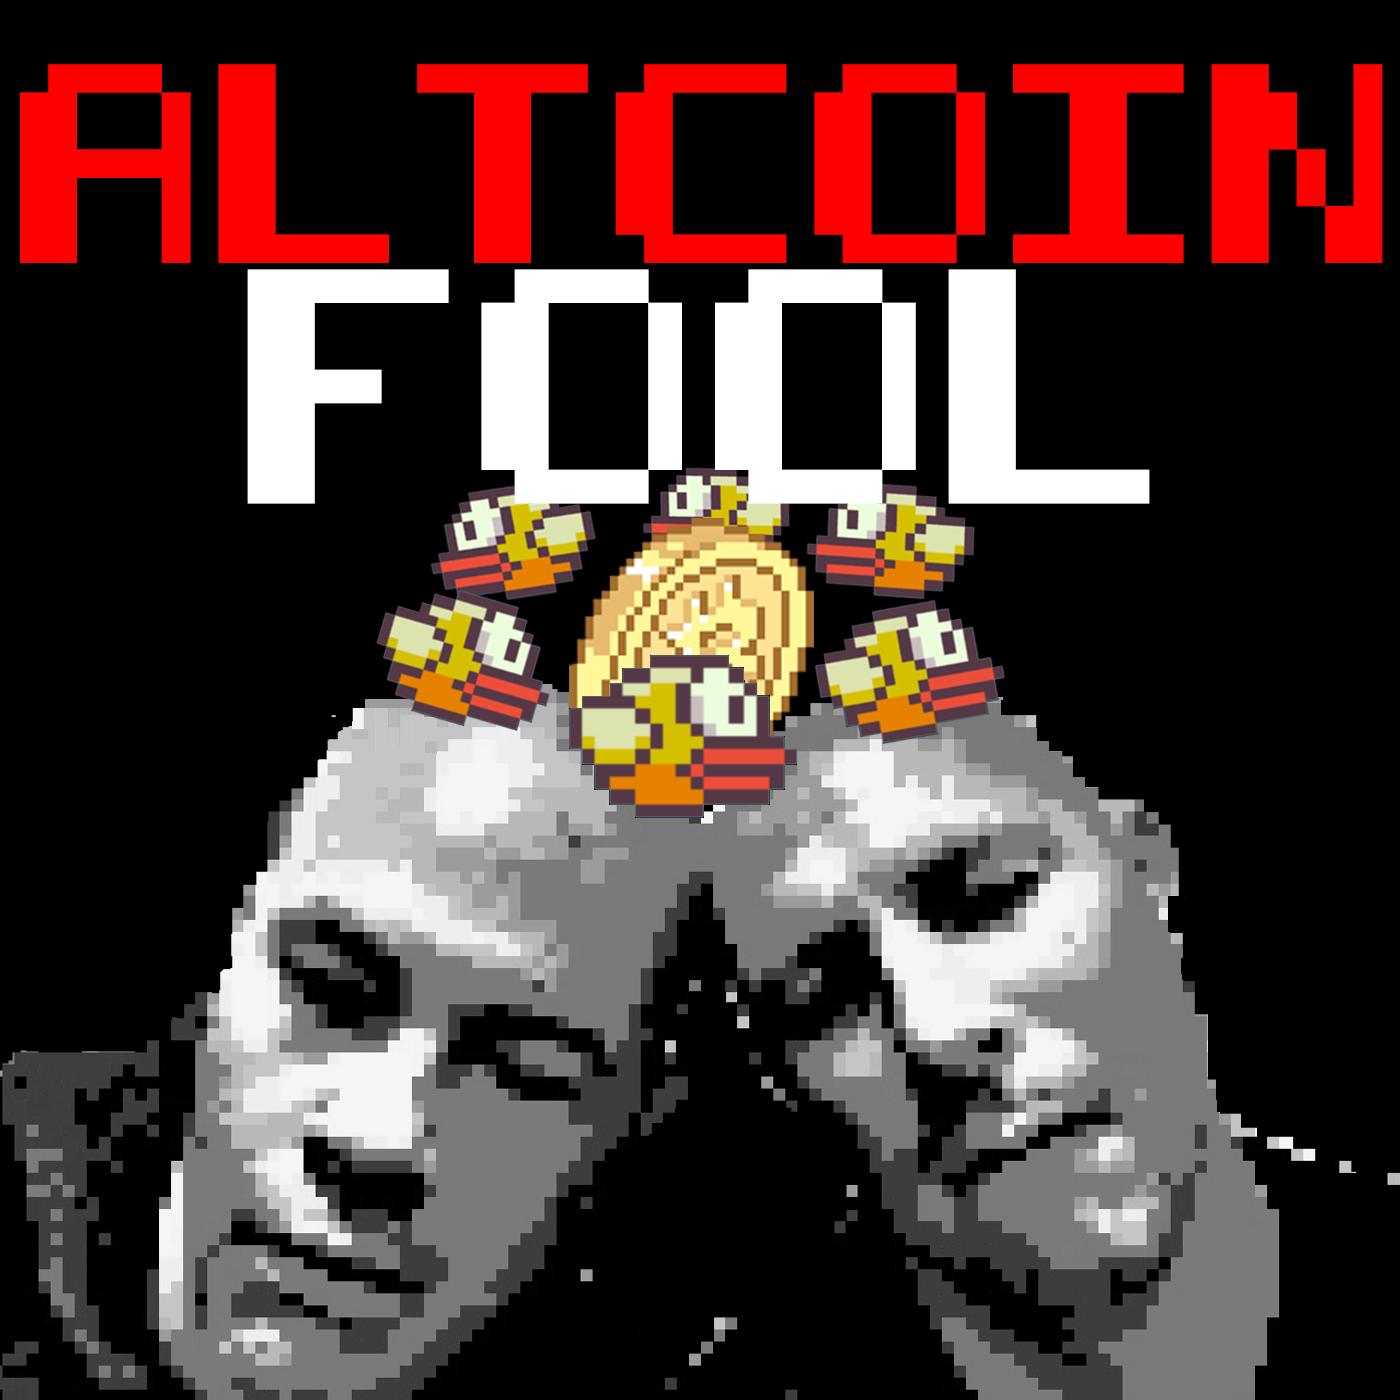 Altcoin Fool